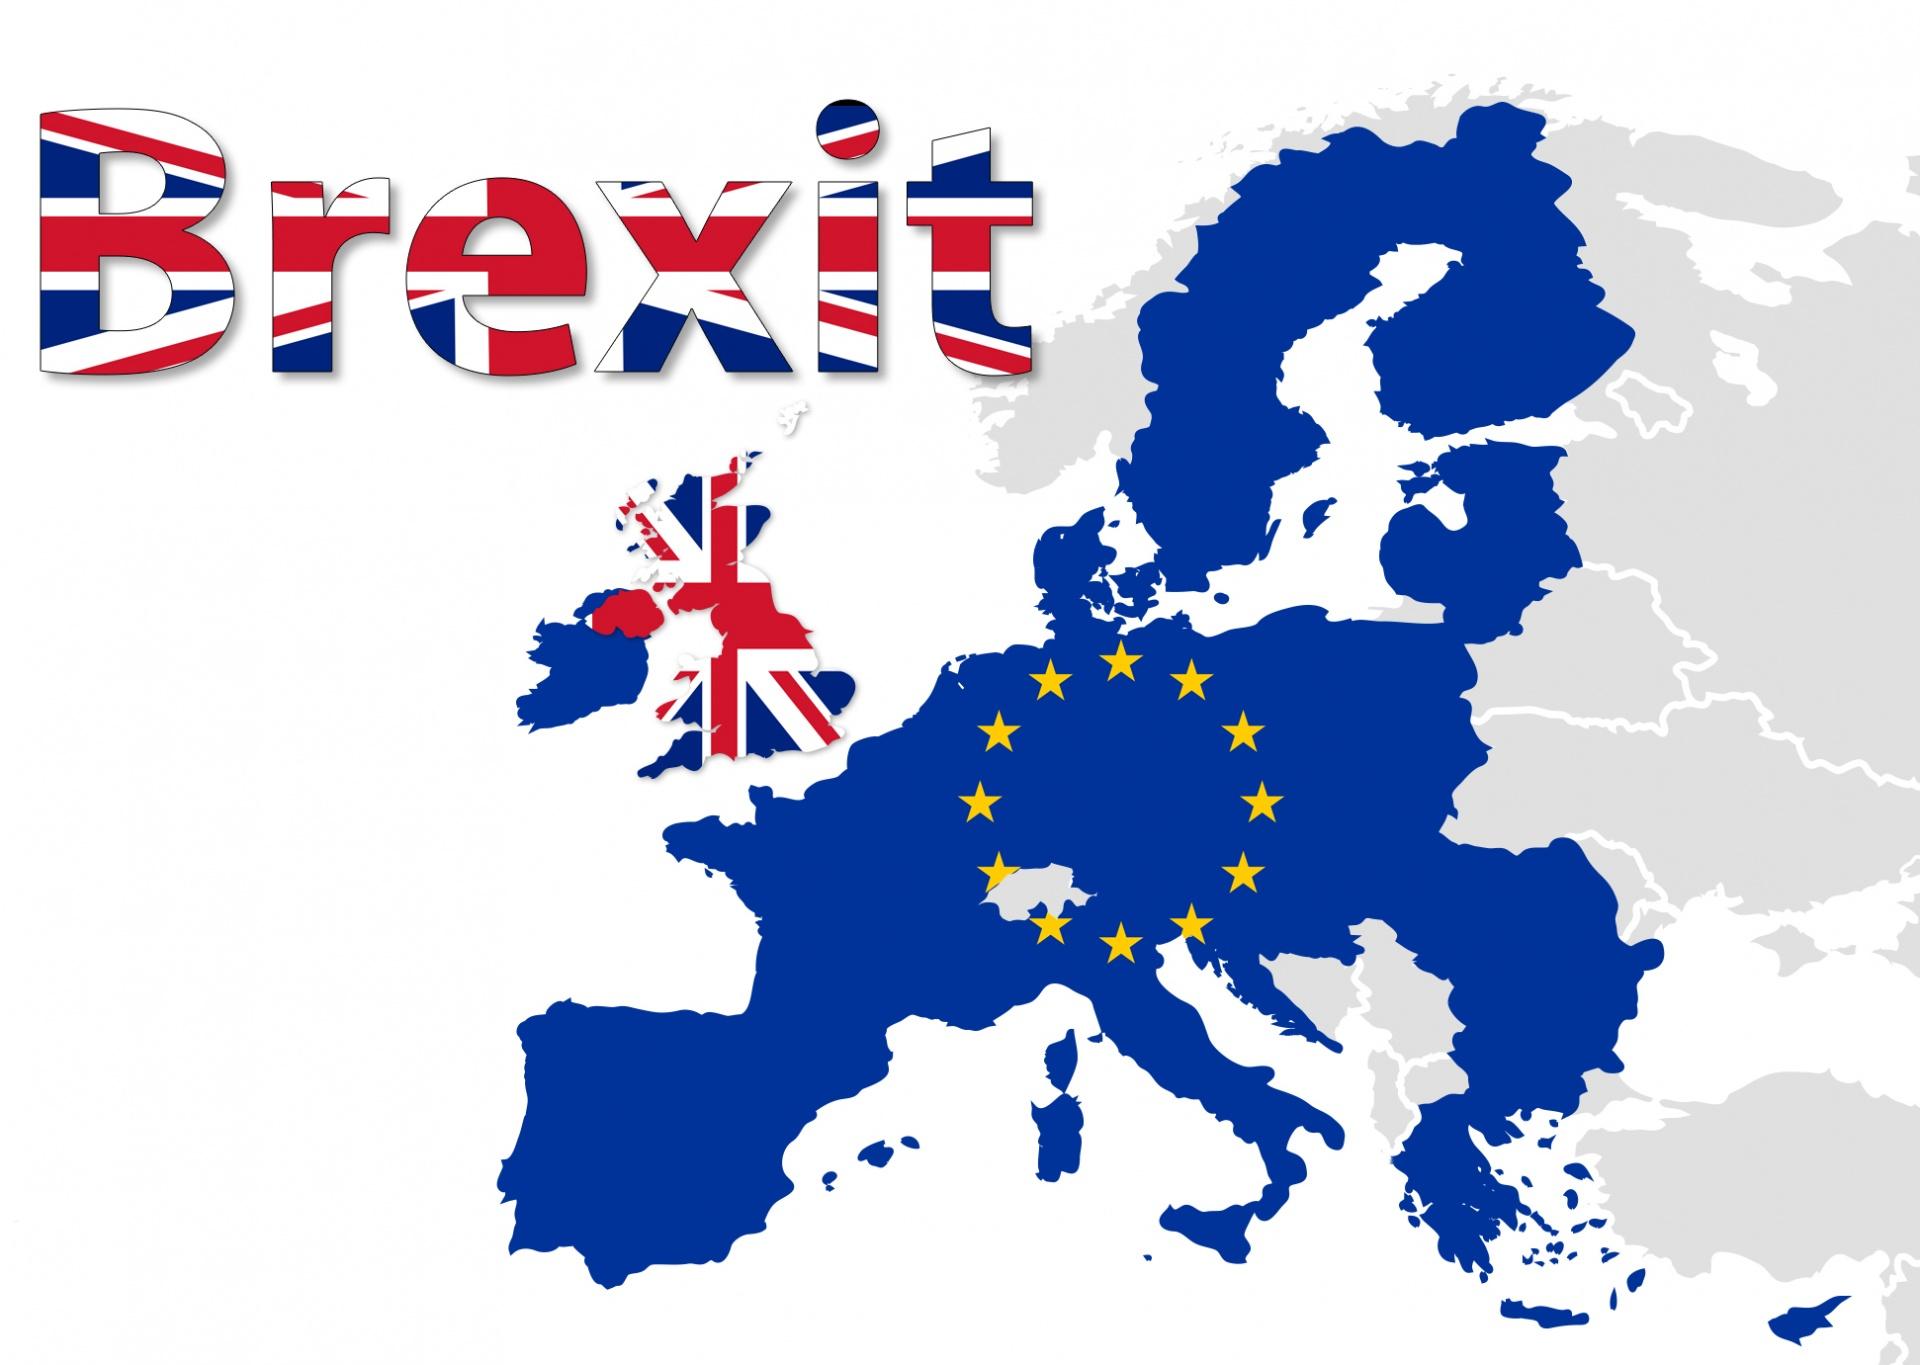 EU court to hear Brexit reversal case on Nov. 27